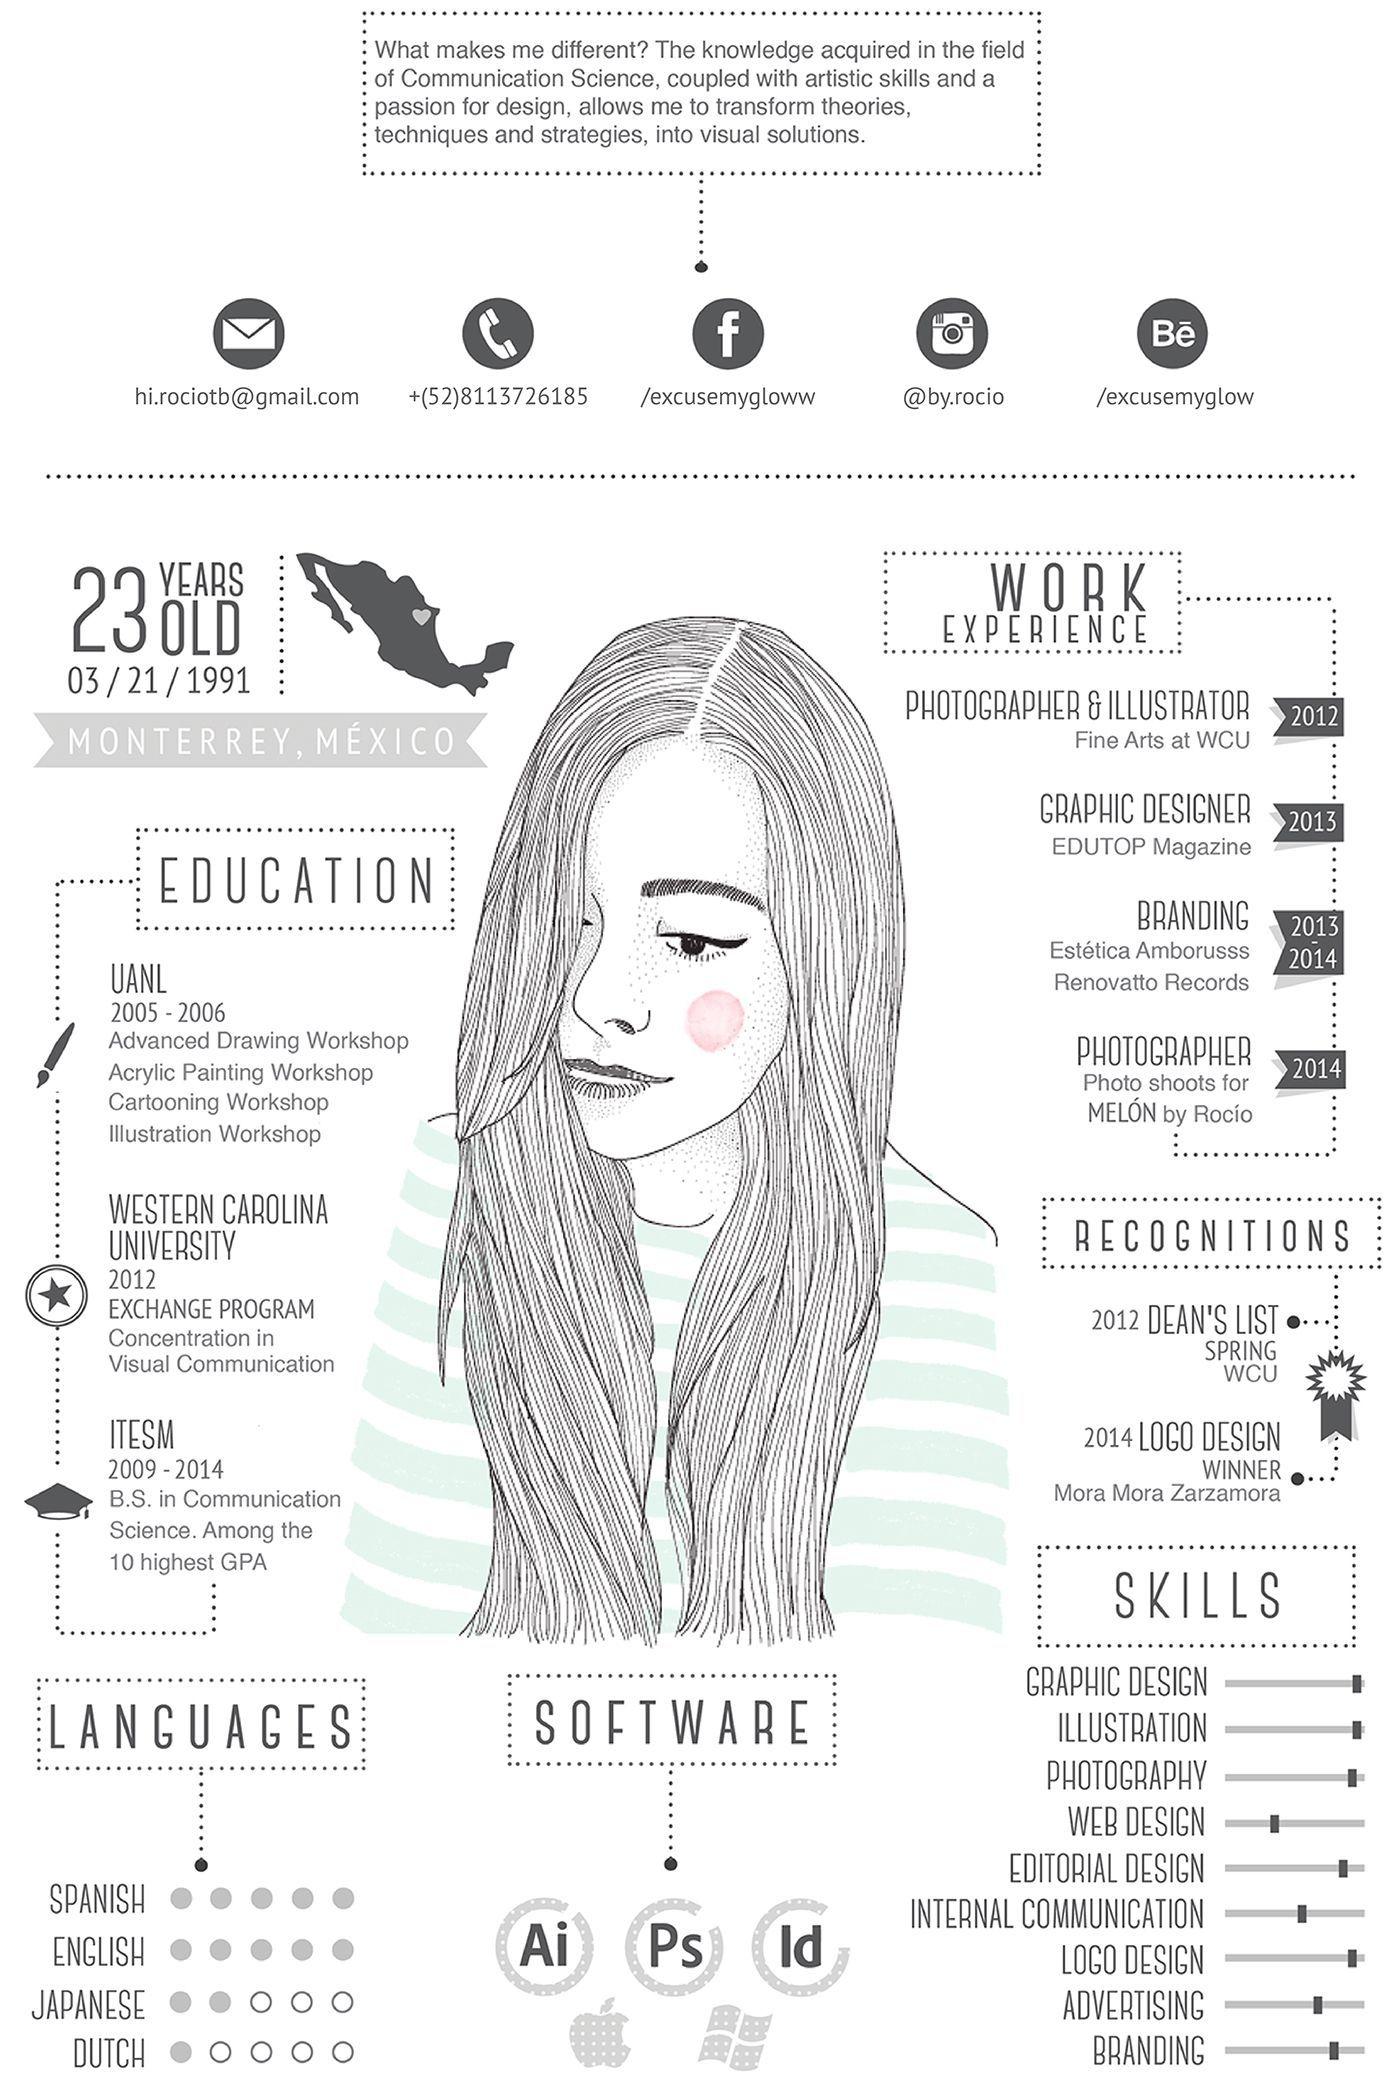 Mein Lebenslauf Ideas Acerca De Comunicacion Infografik Lebenslauf Lebenslauf Ideen Kreativer Lebenslauf